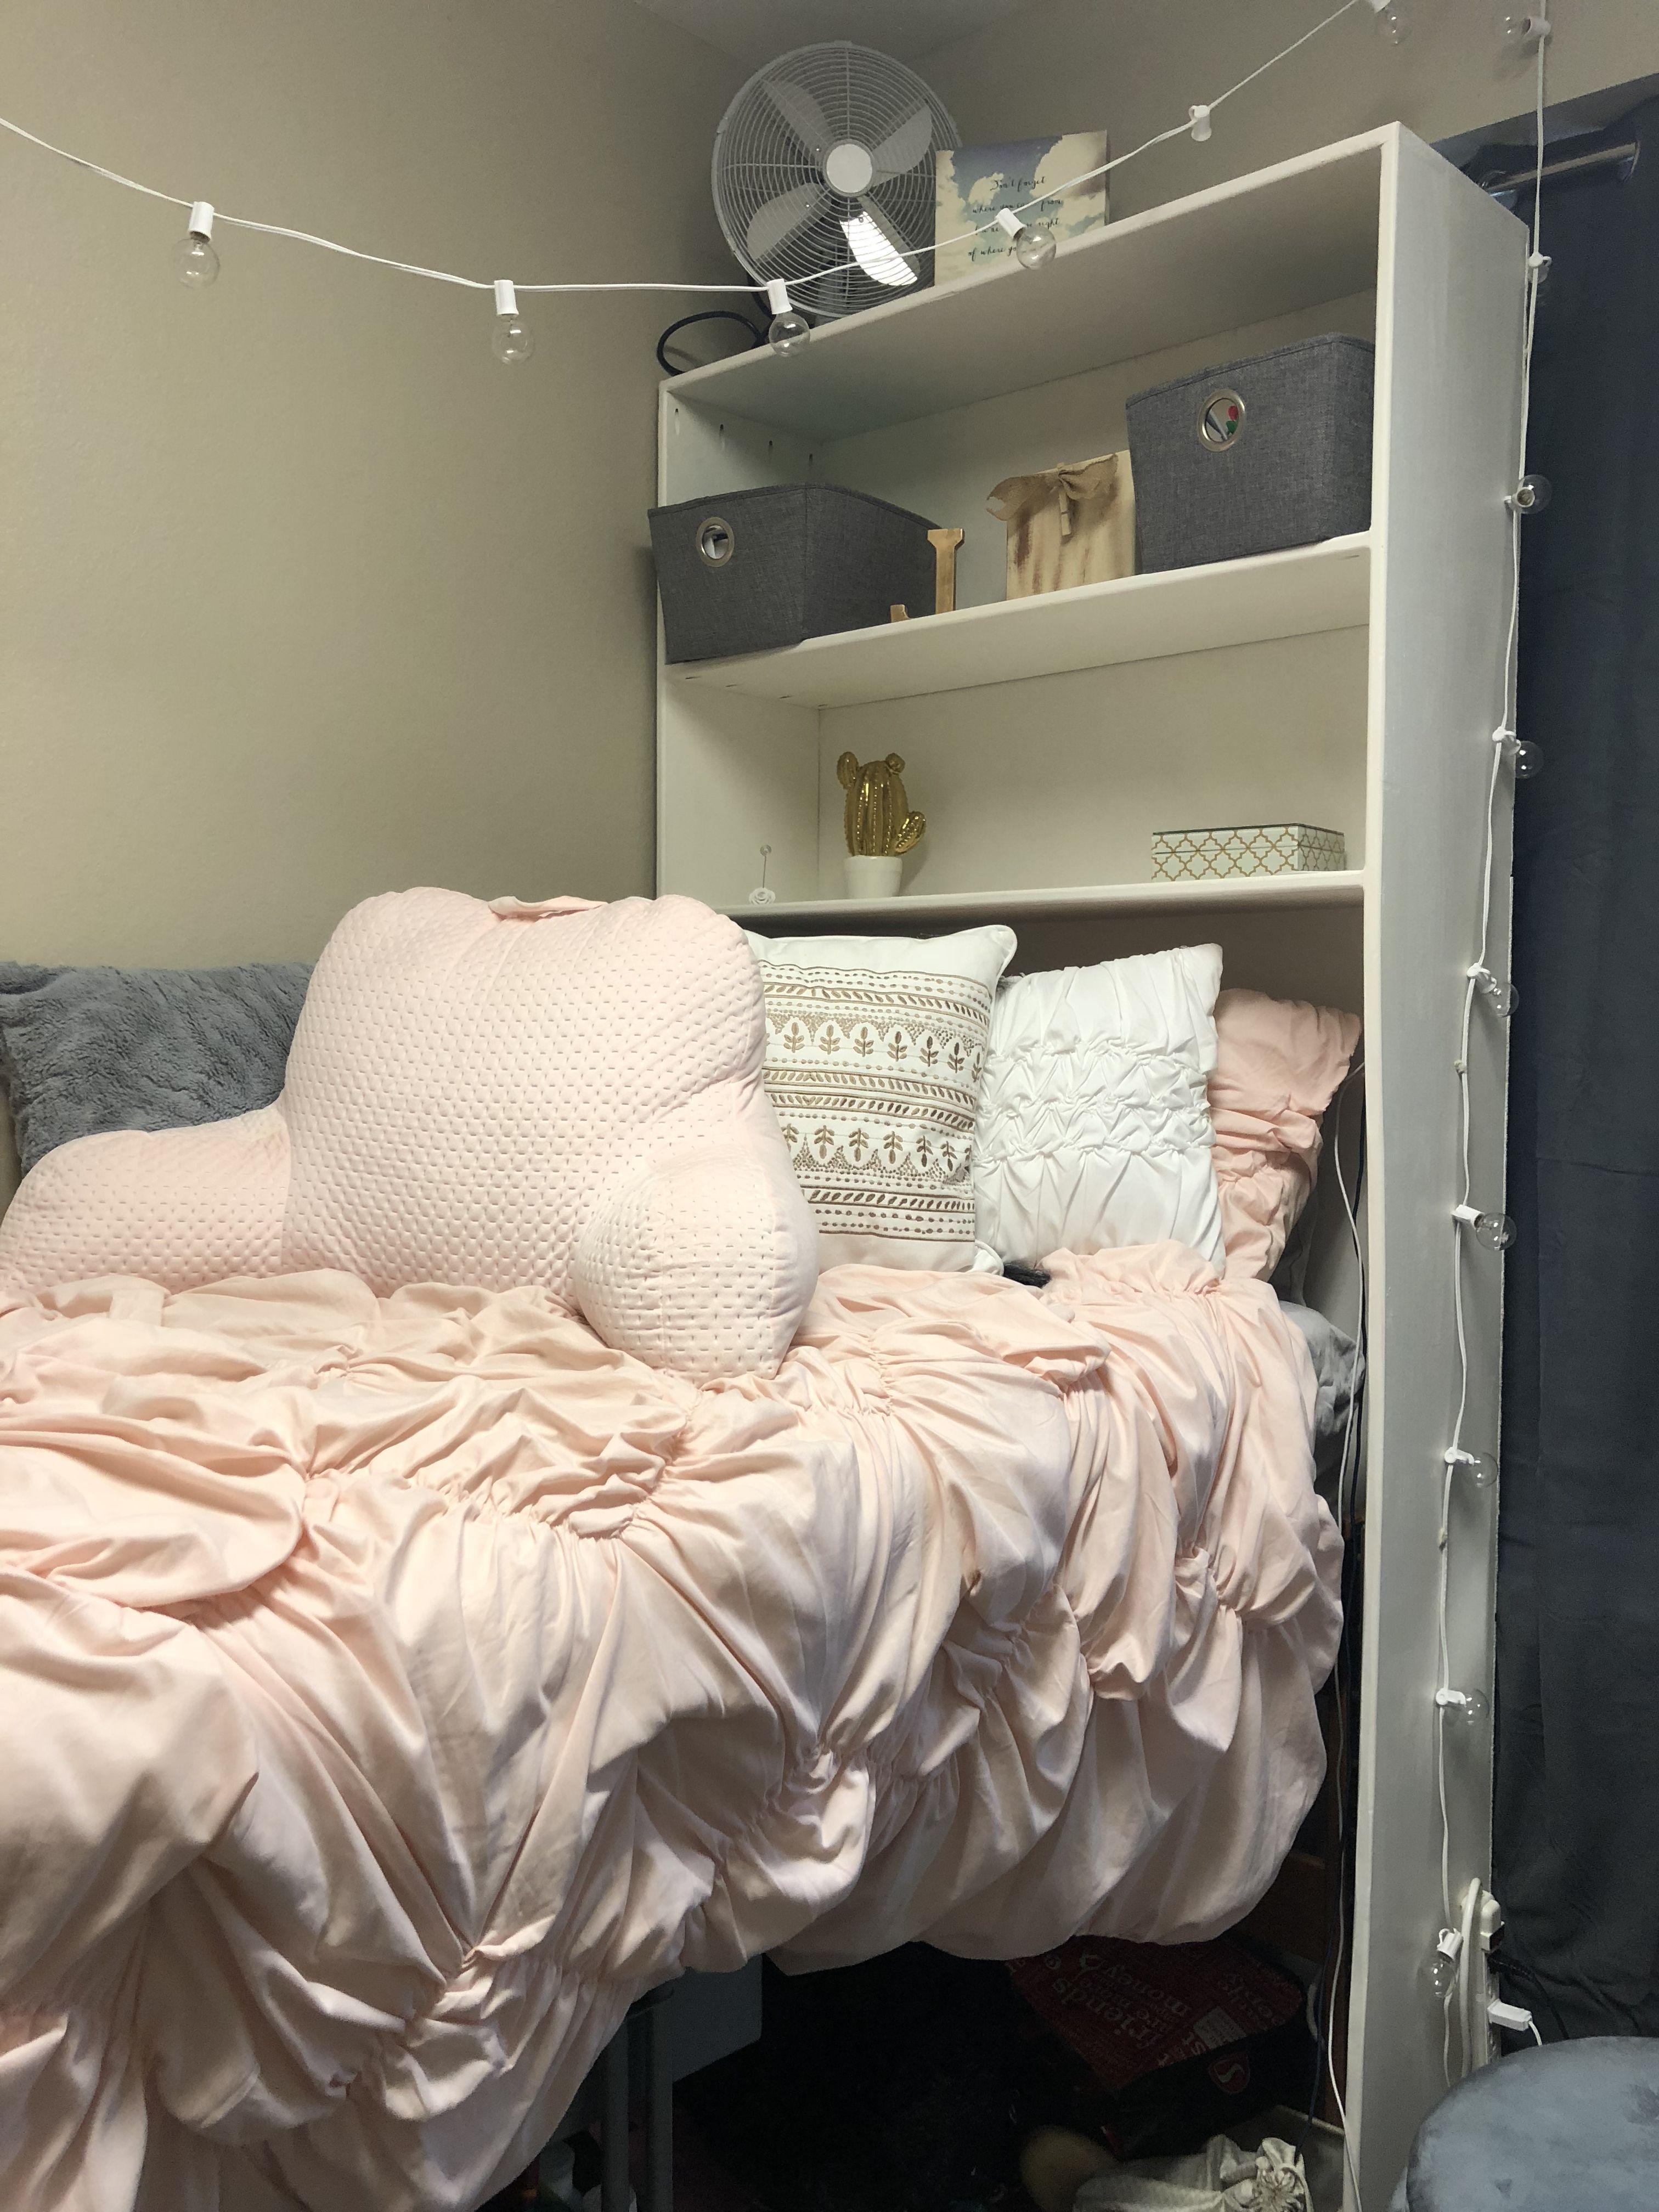 Dorm Room Headboards: Dorm Room Headboards, Dorm